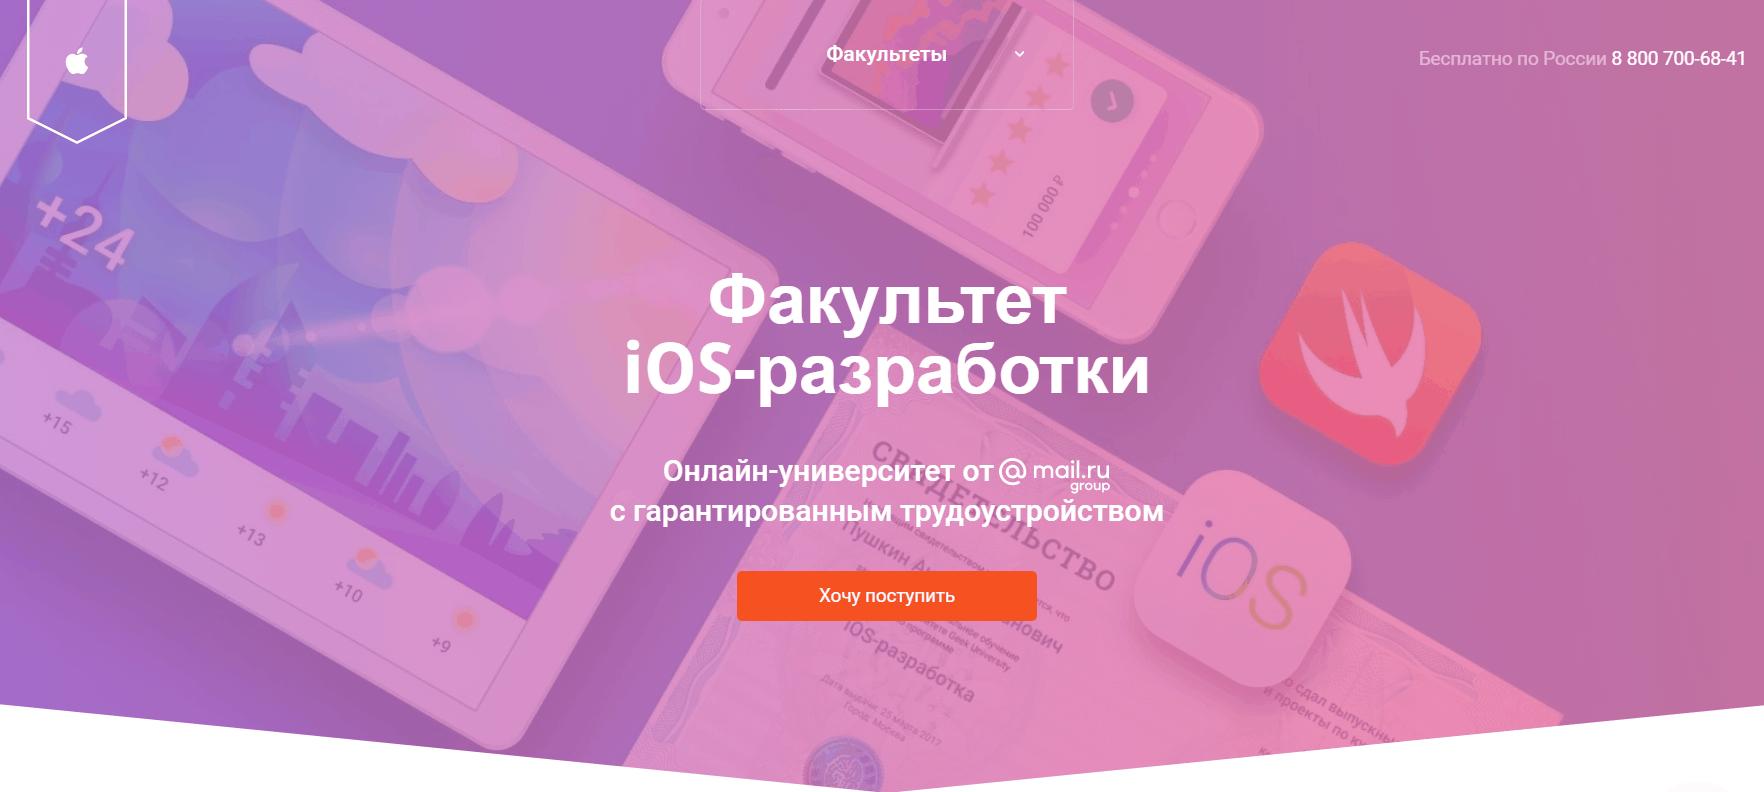 Факультет iOS-разработки от GeekBrains